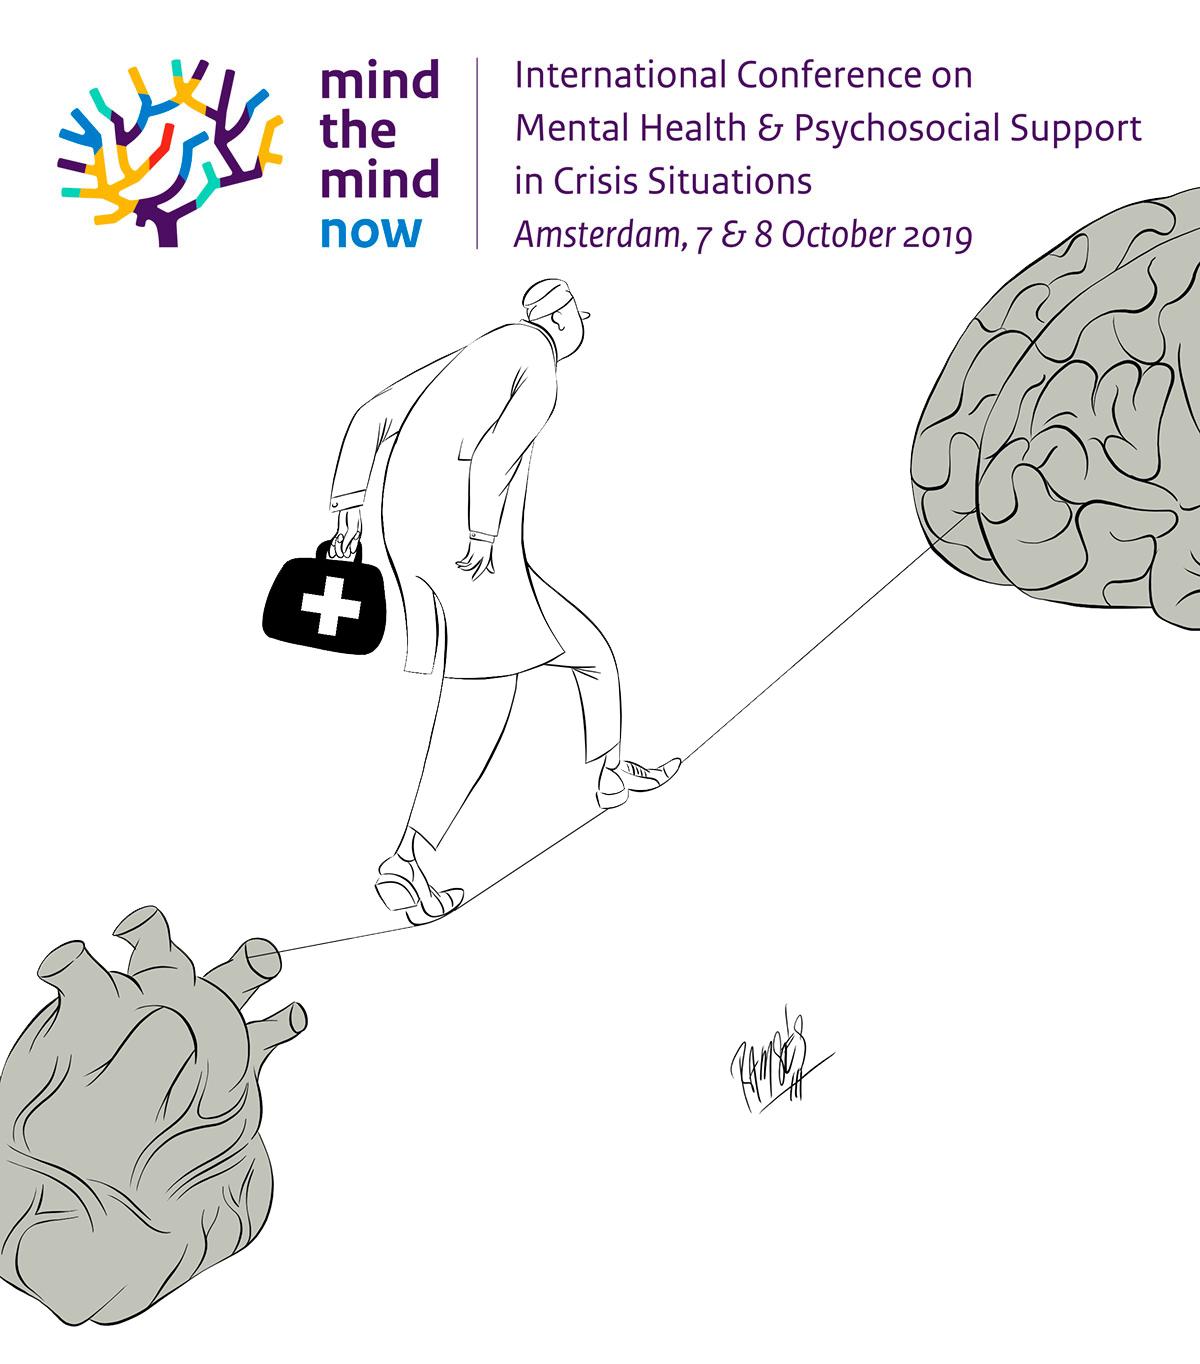 Mental health conference logo